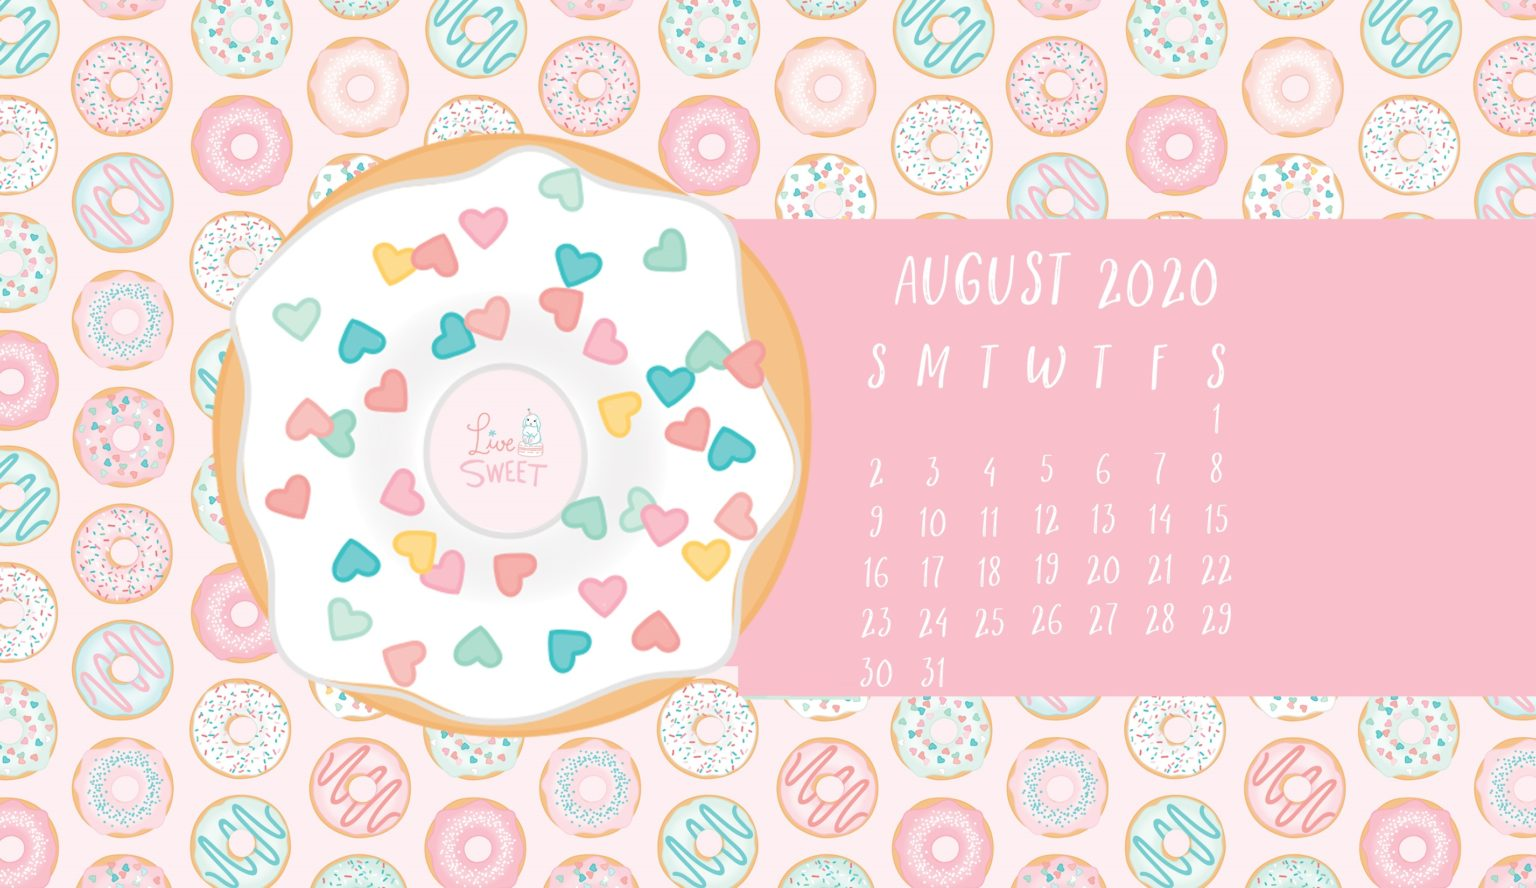 Free August 2020 Desktop Wallpaper